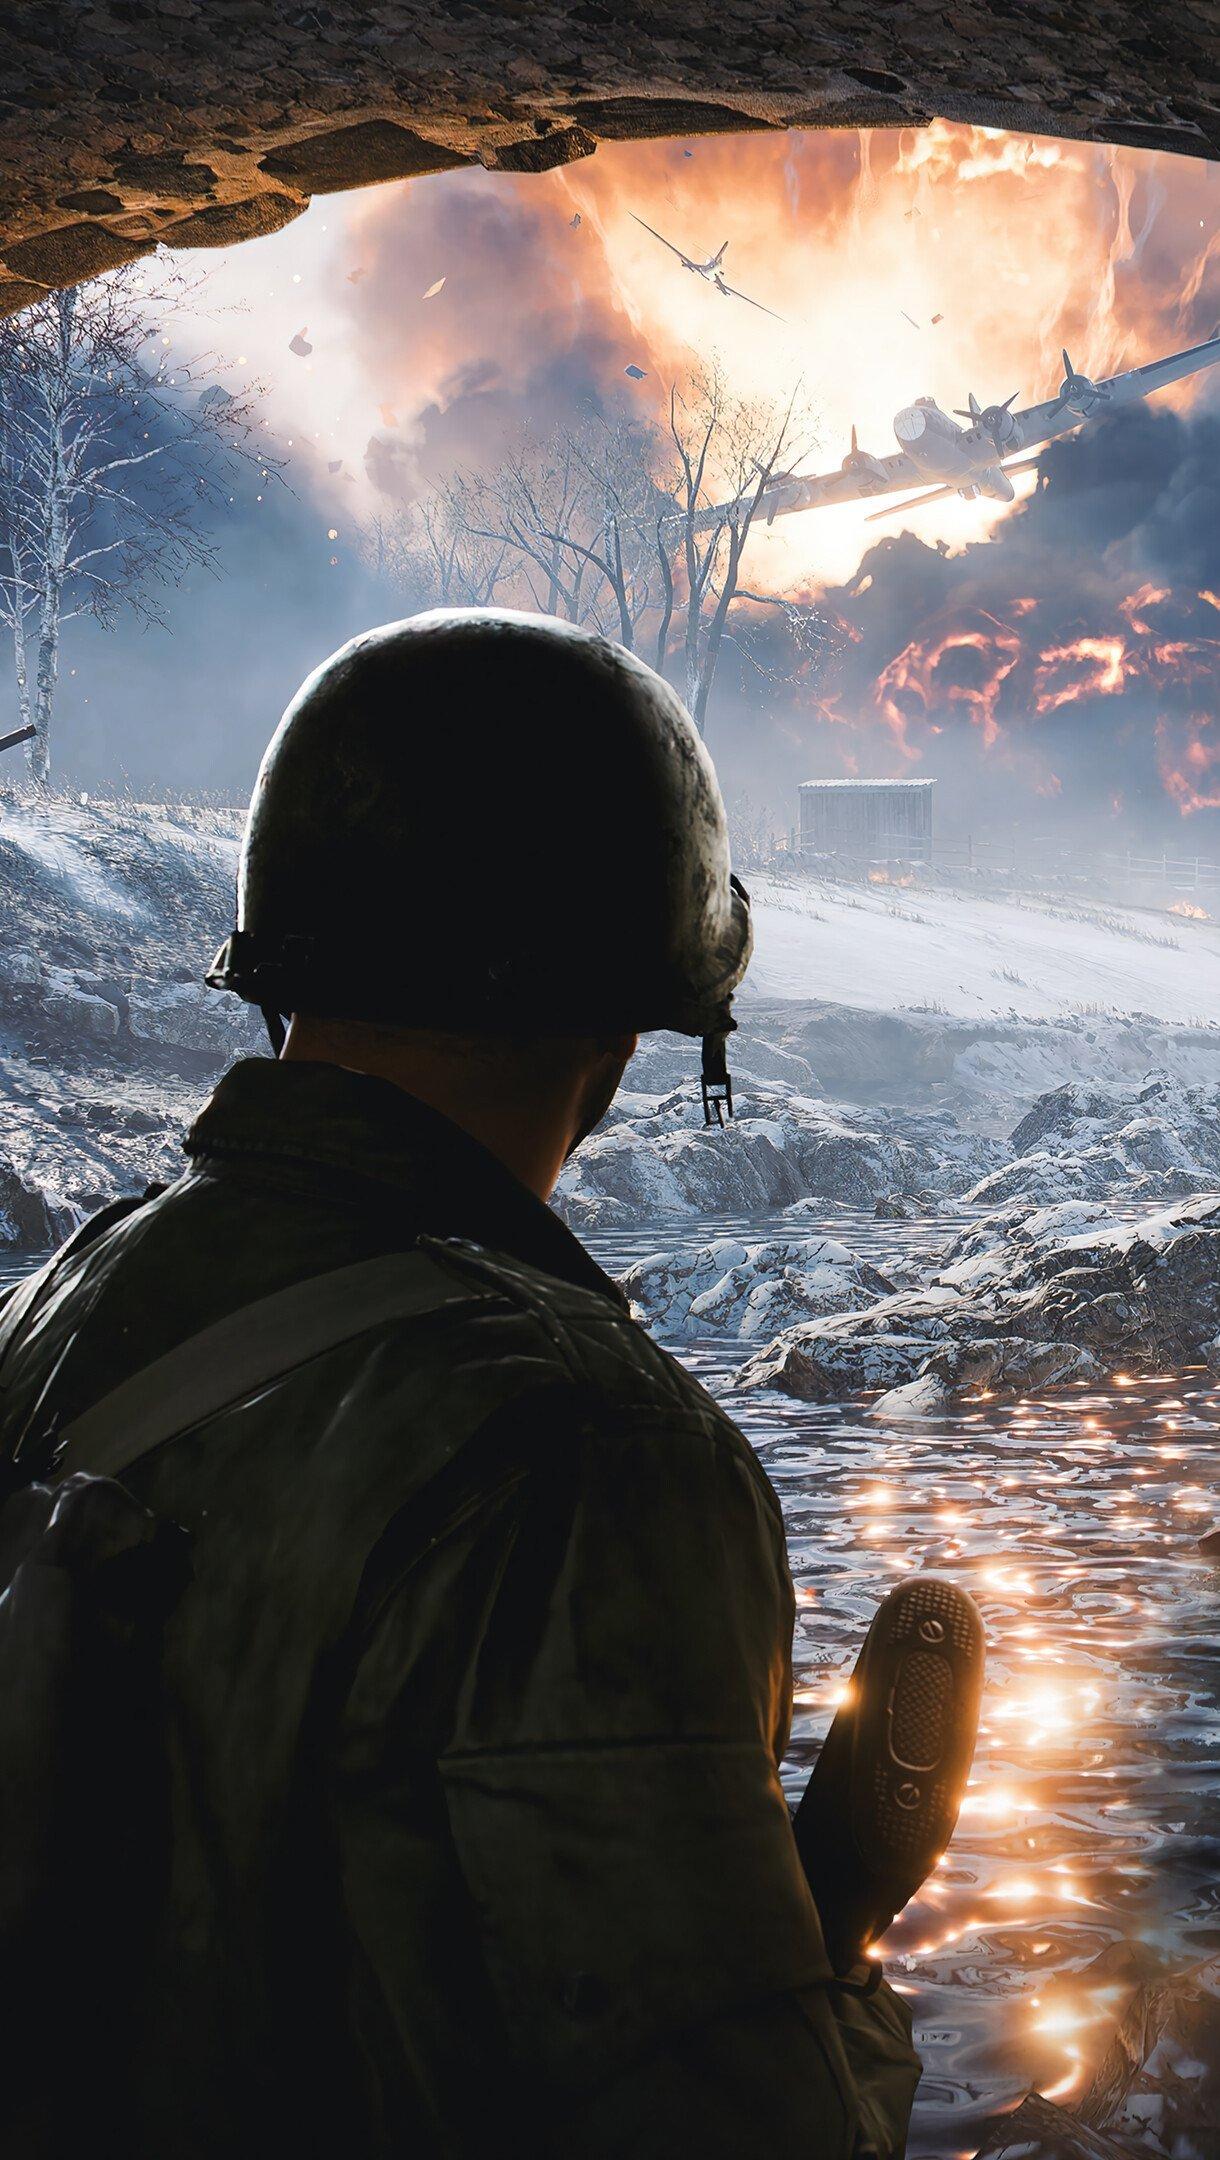 Wallpaper Soldier in Battlefield 2042 Vertical